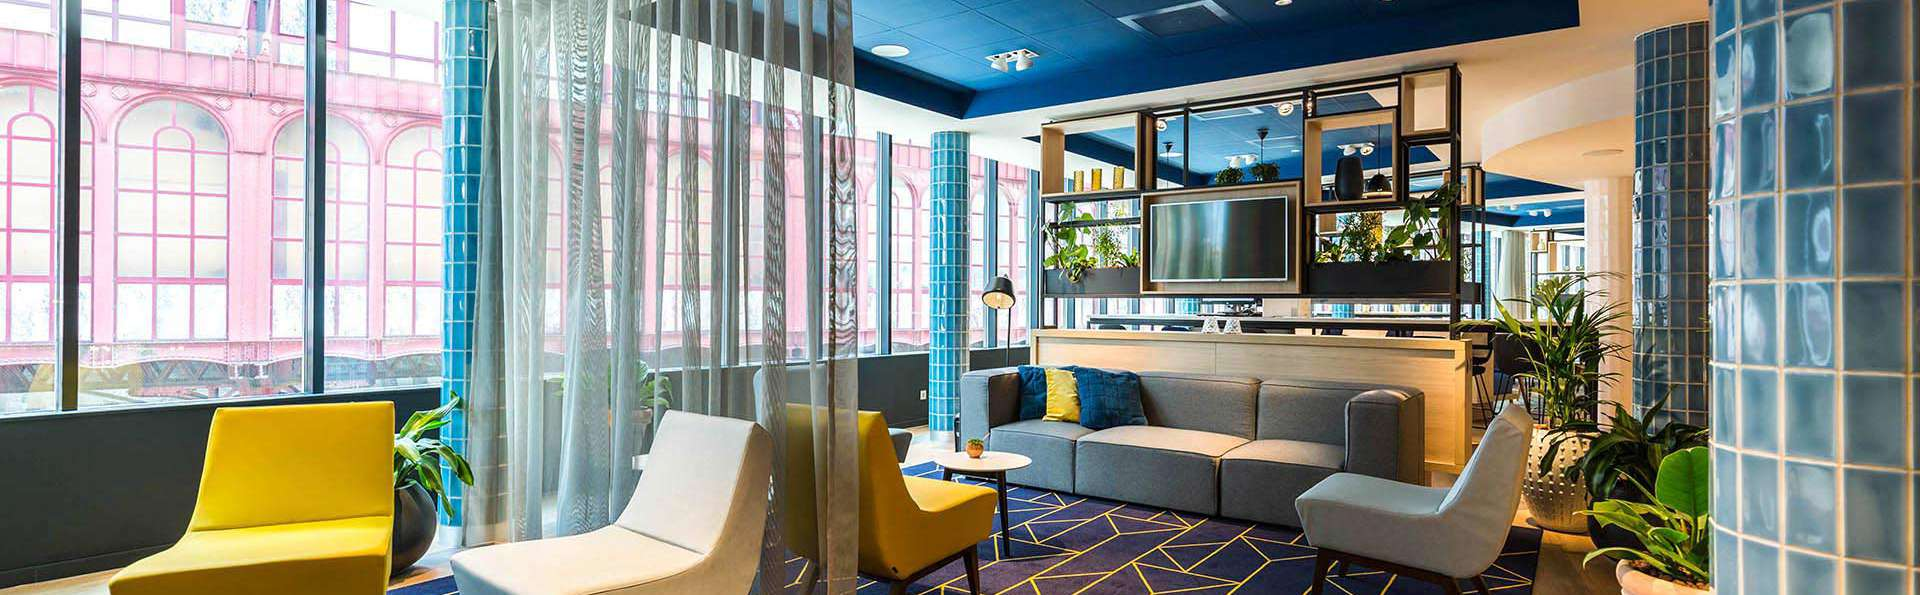 Hampton by Hilton Antwerp Central Station - ANRCS_Lobby1.jpg